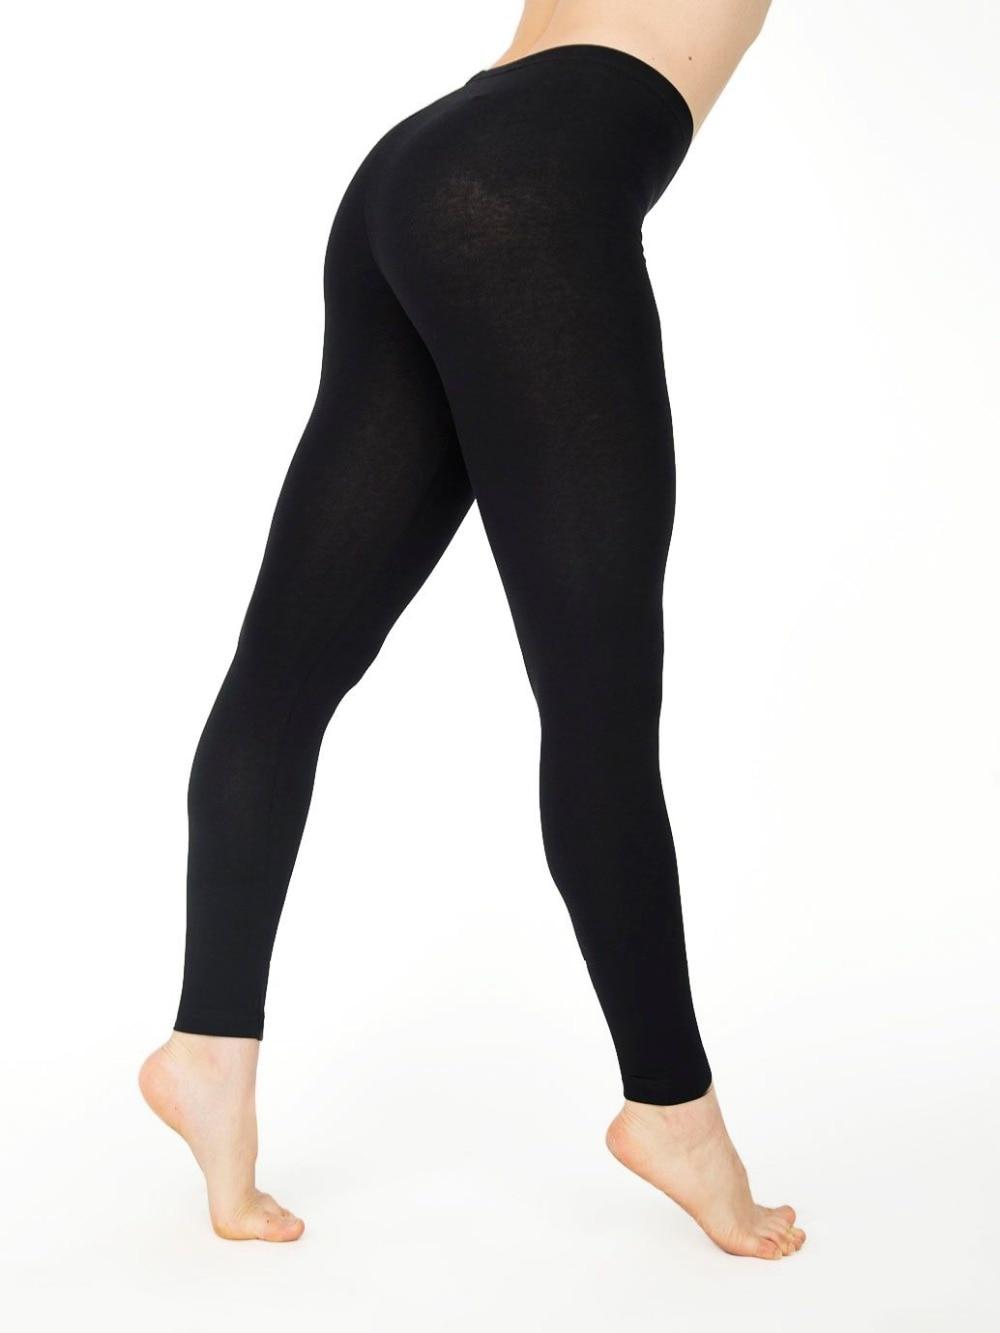 008a0cc9484 Bohocotol 2018 Women pants American Ladies Leggings Sexy Black And White  Sexy Legging Ladies Fitness Legins